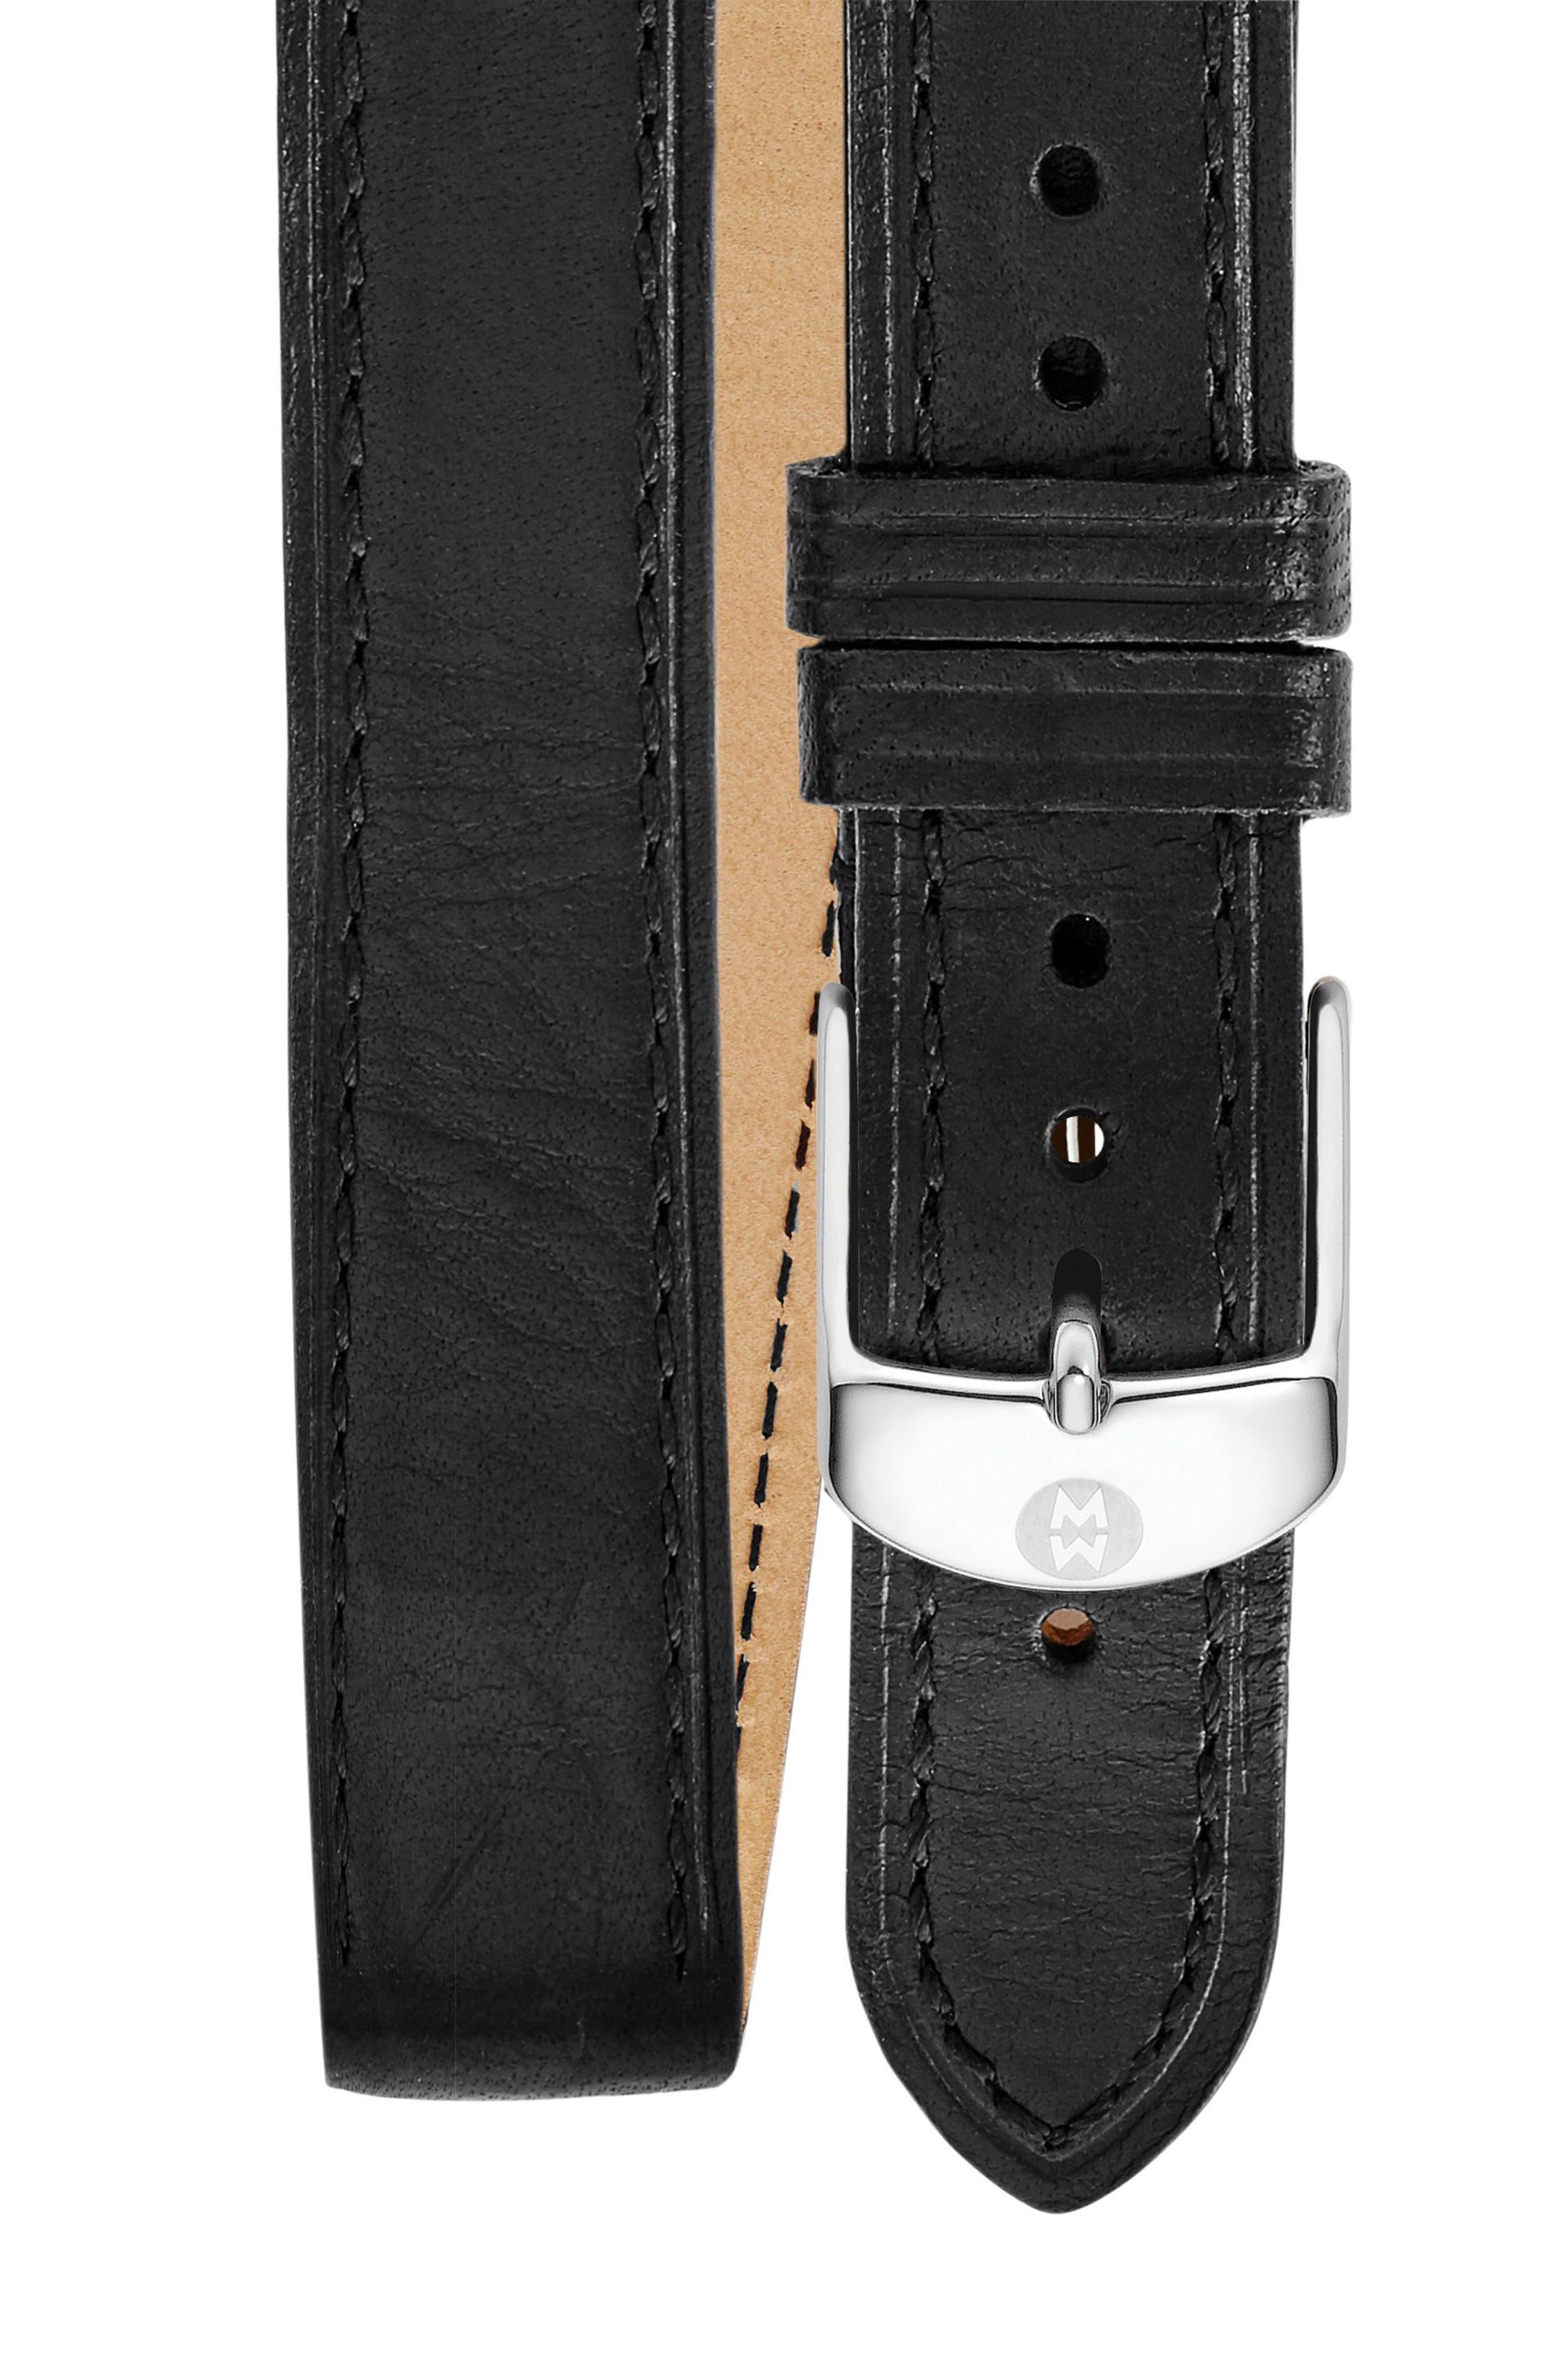 16mm Double Wrap Leather Watch Strap,                             Main thumbnail 1, color,                             BLACK